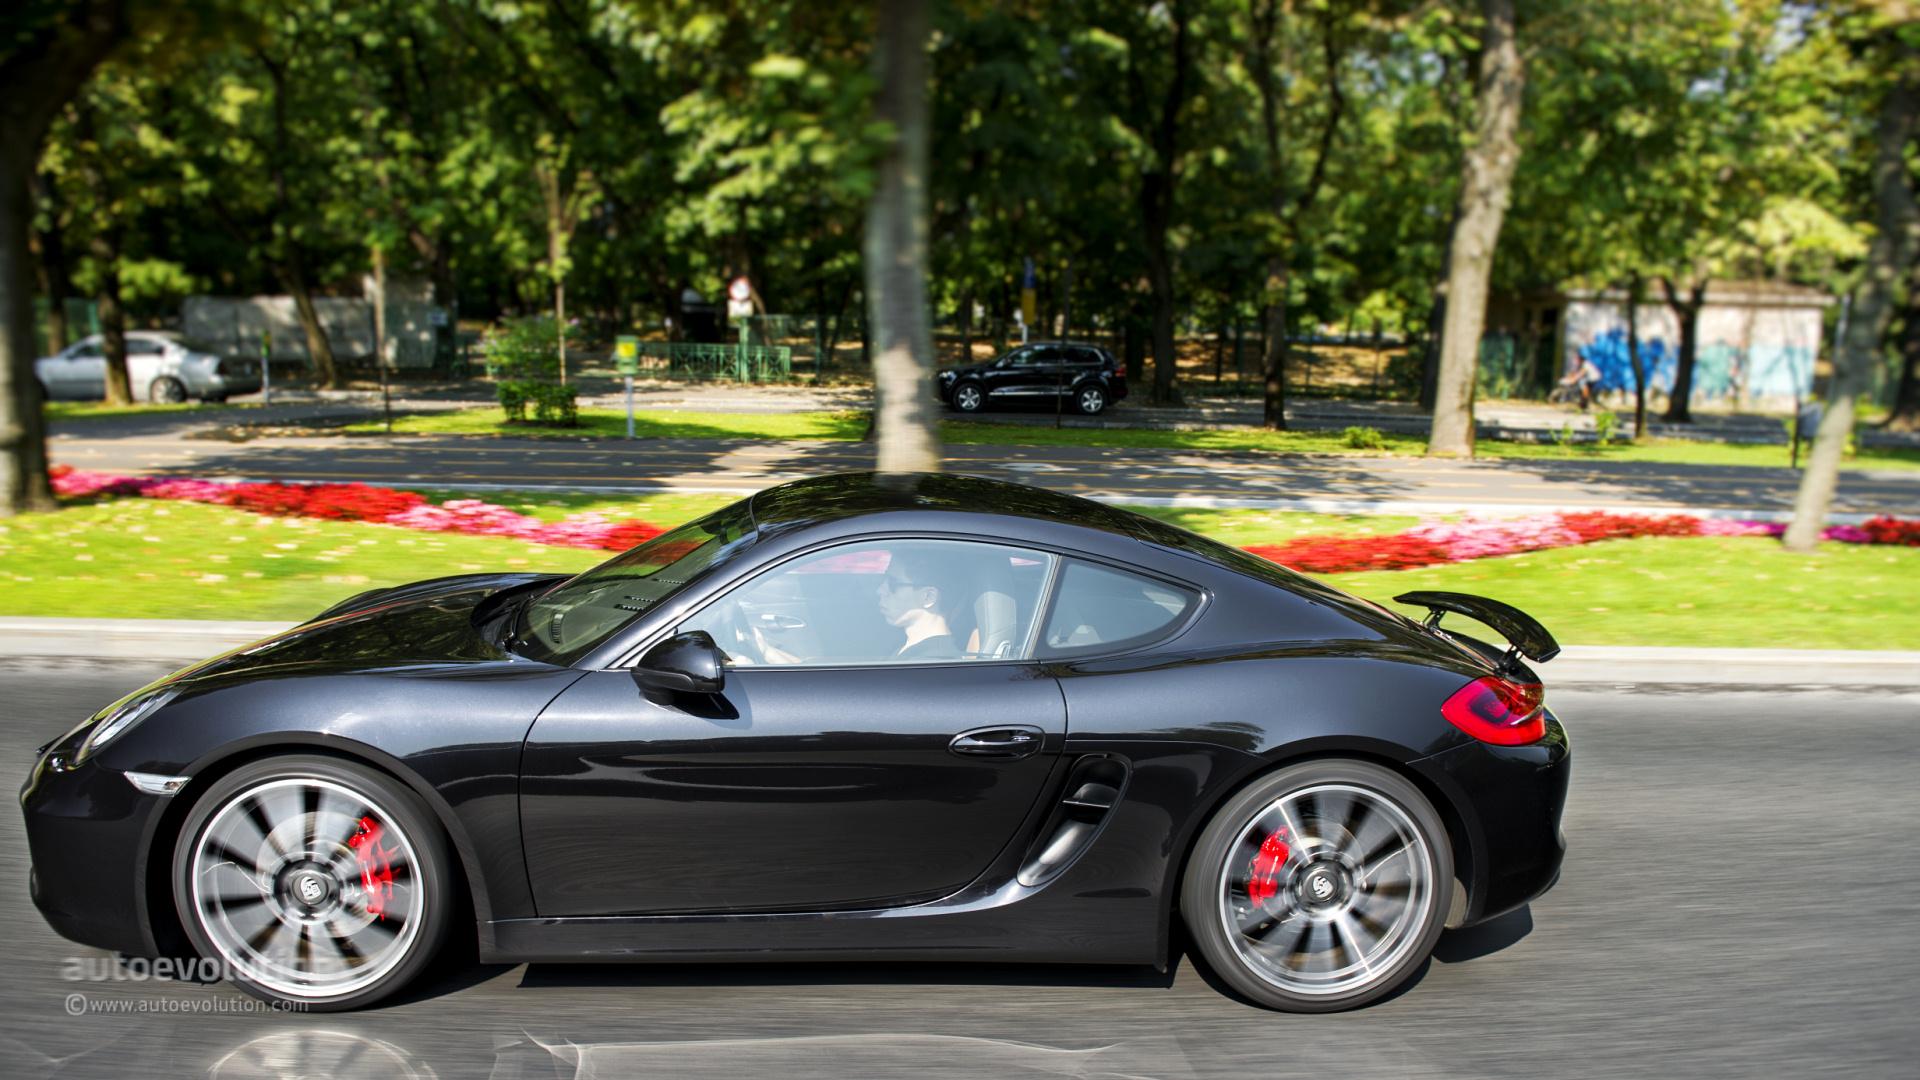 Nova Car Wallpaper 2014 Porsche Cayman S Review Autoevolution